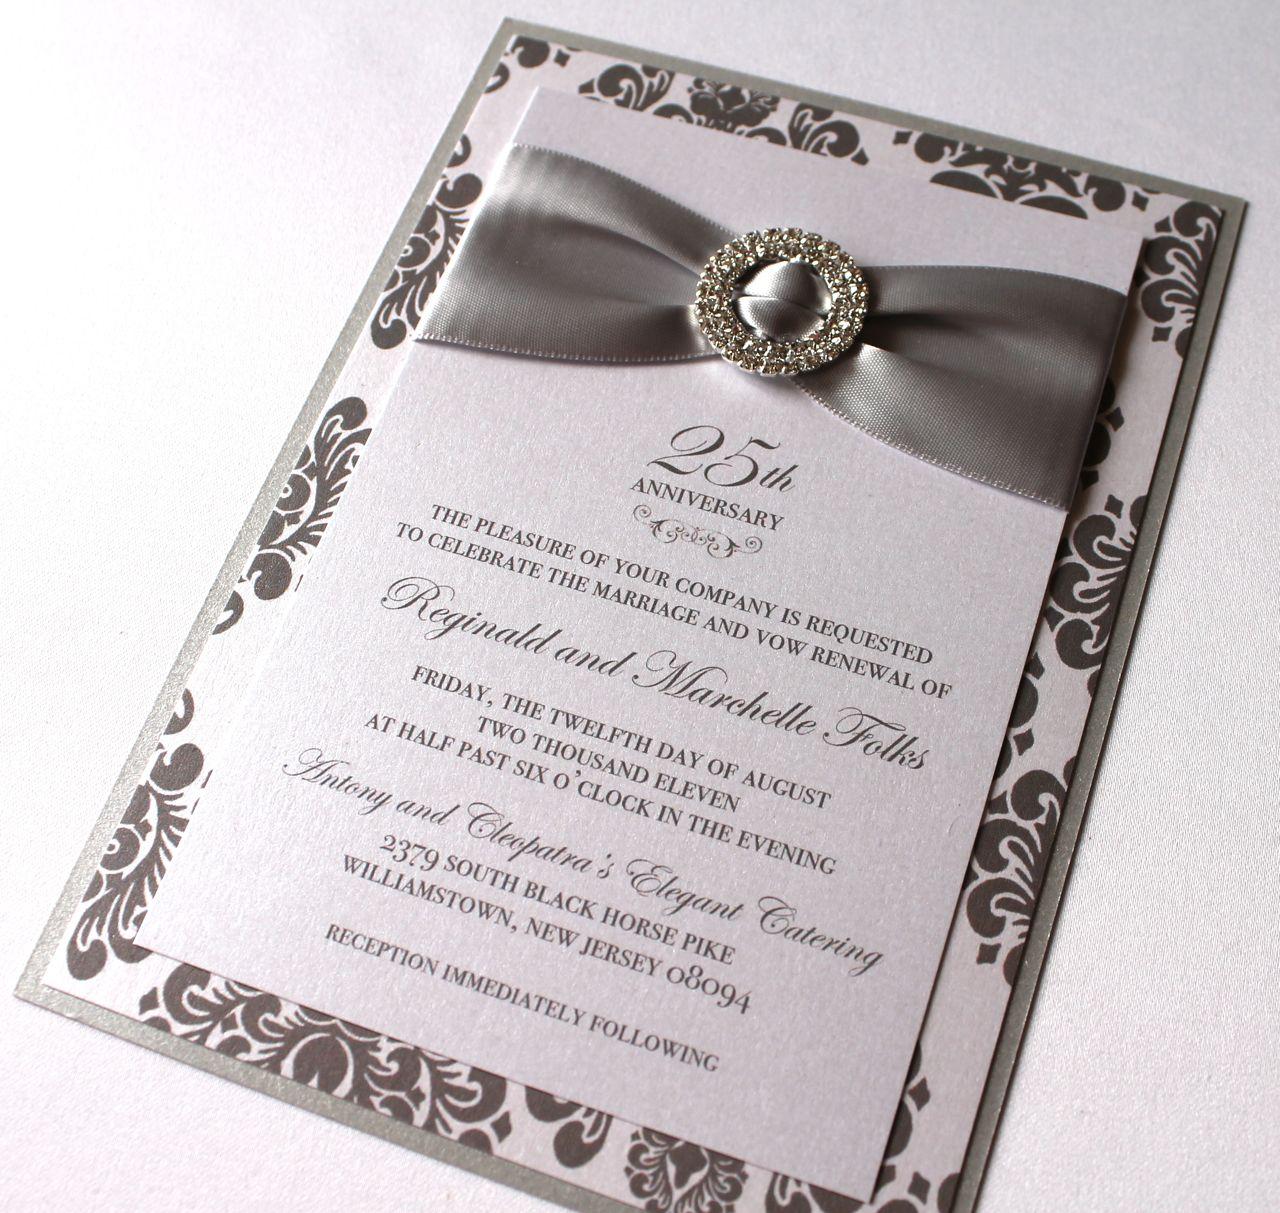 Wedding Anniversary Invitations: Embellished Paperie: 25th Anniversary Invitations, Silver